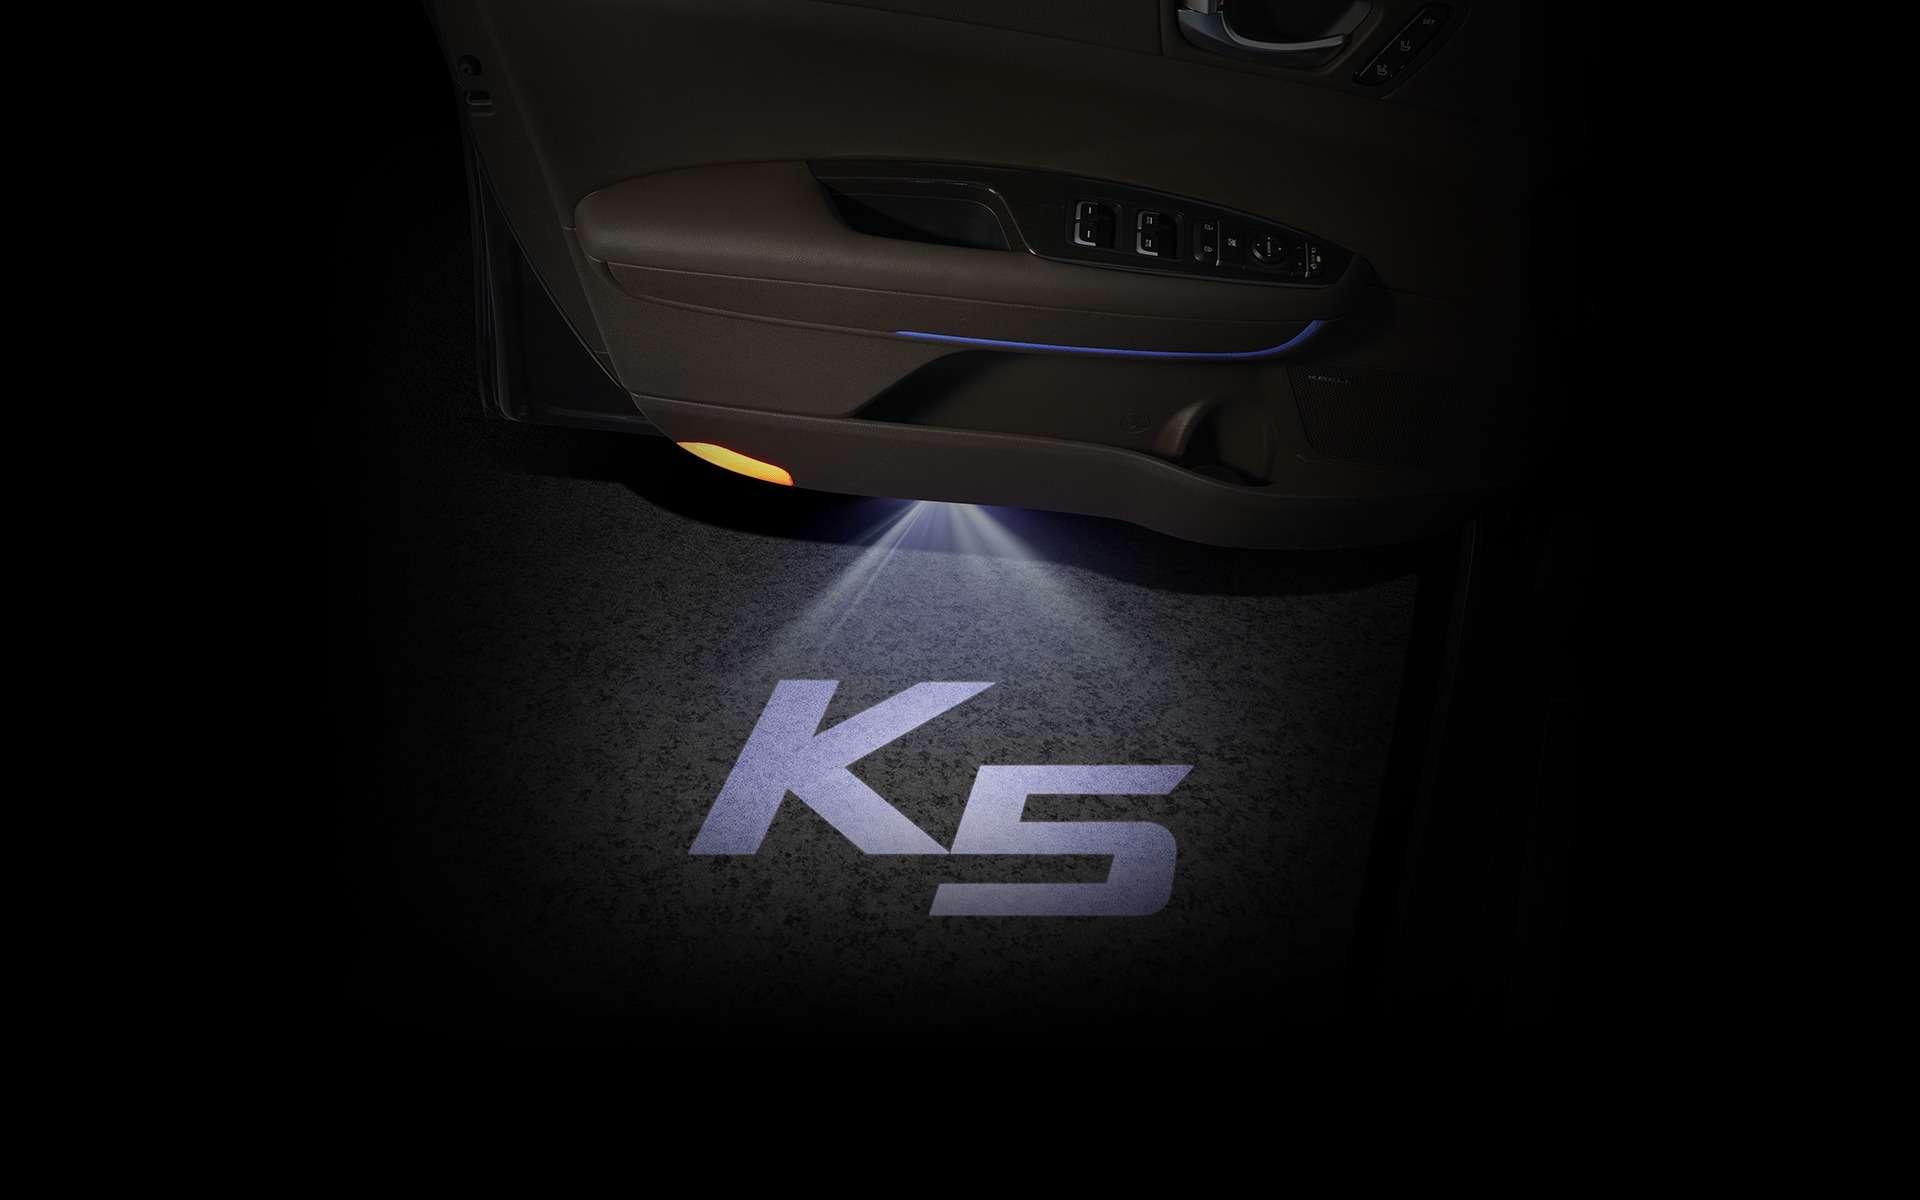 Обновленная Kia Optima: впогоне заCamry— фото 839055